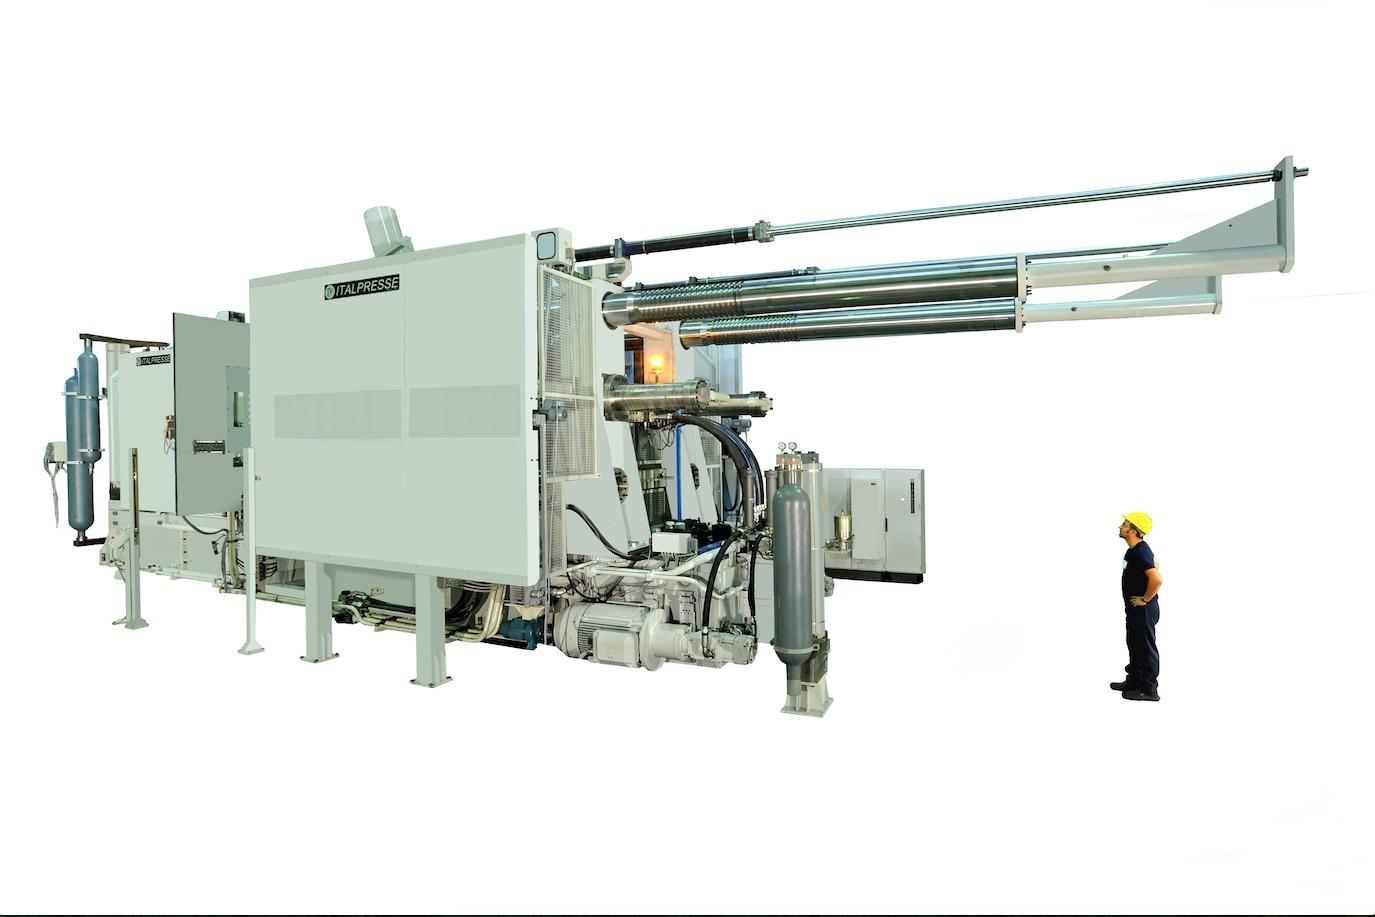 Bild 1:Druckgussmaschine Serie TF, Italpresse Industrie S.r.l.